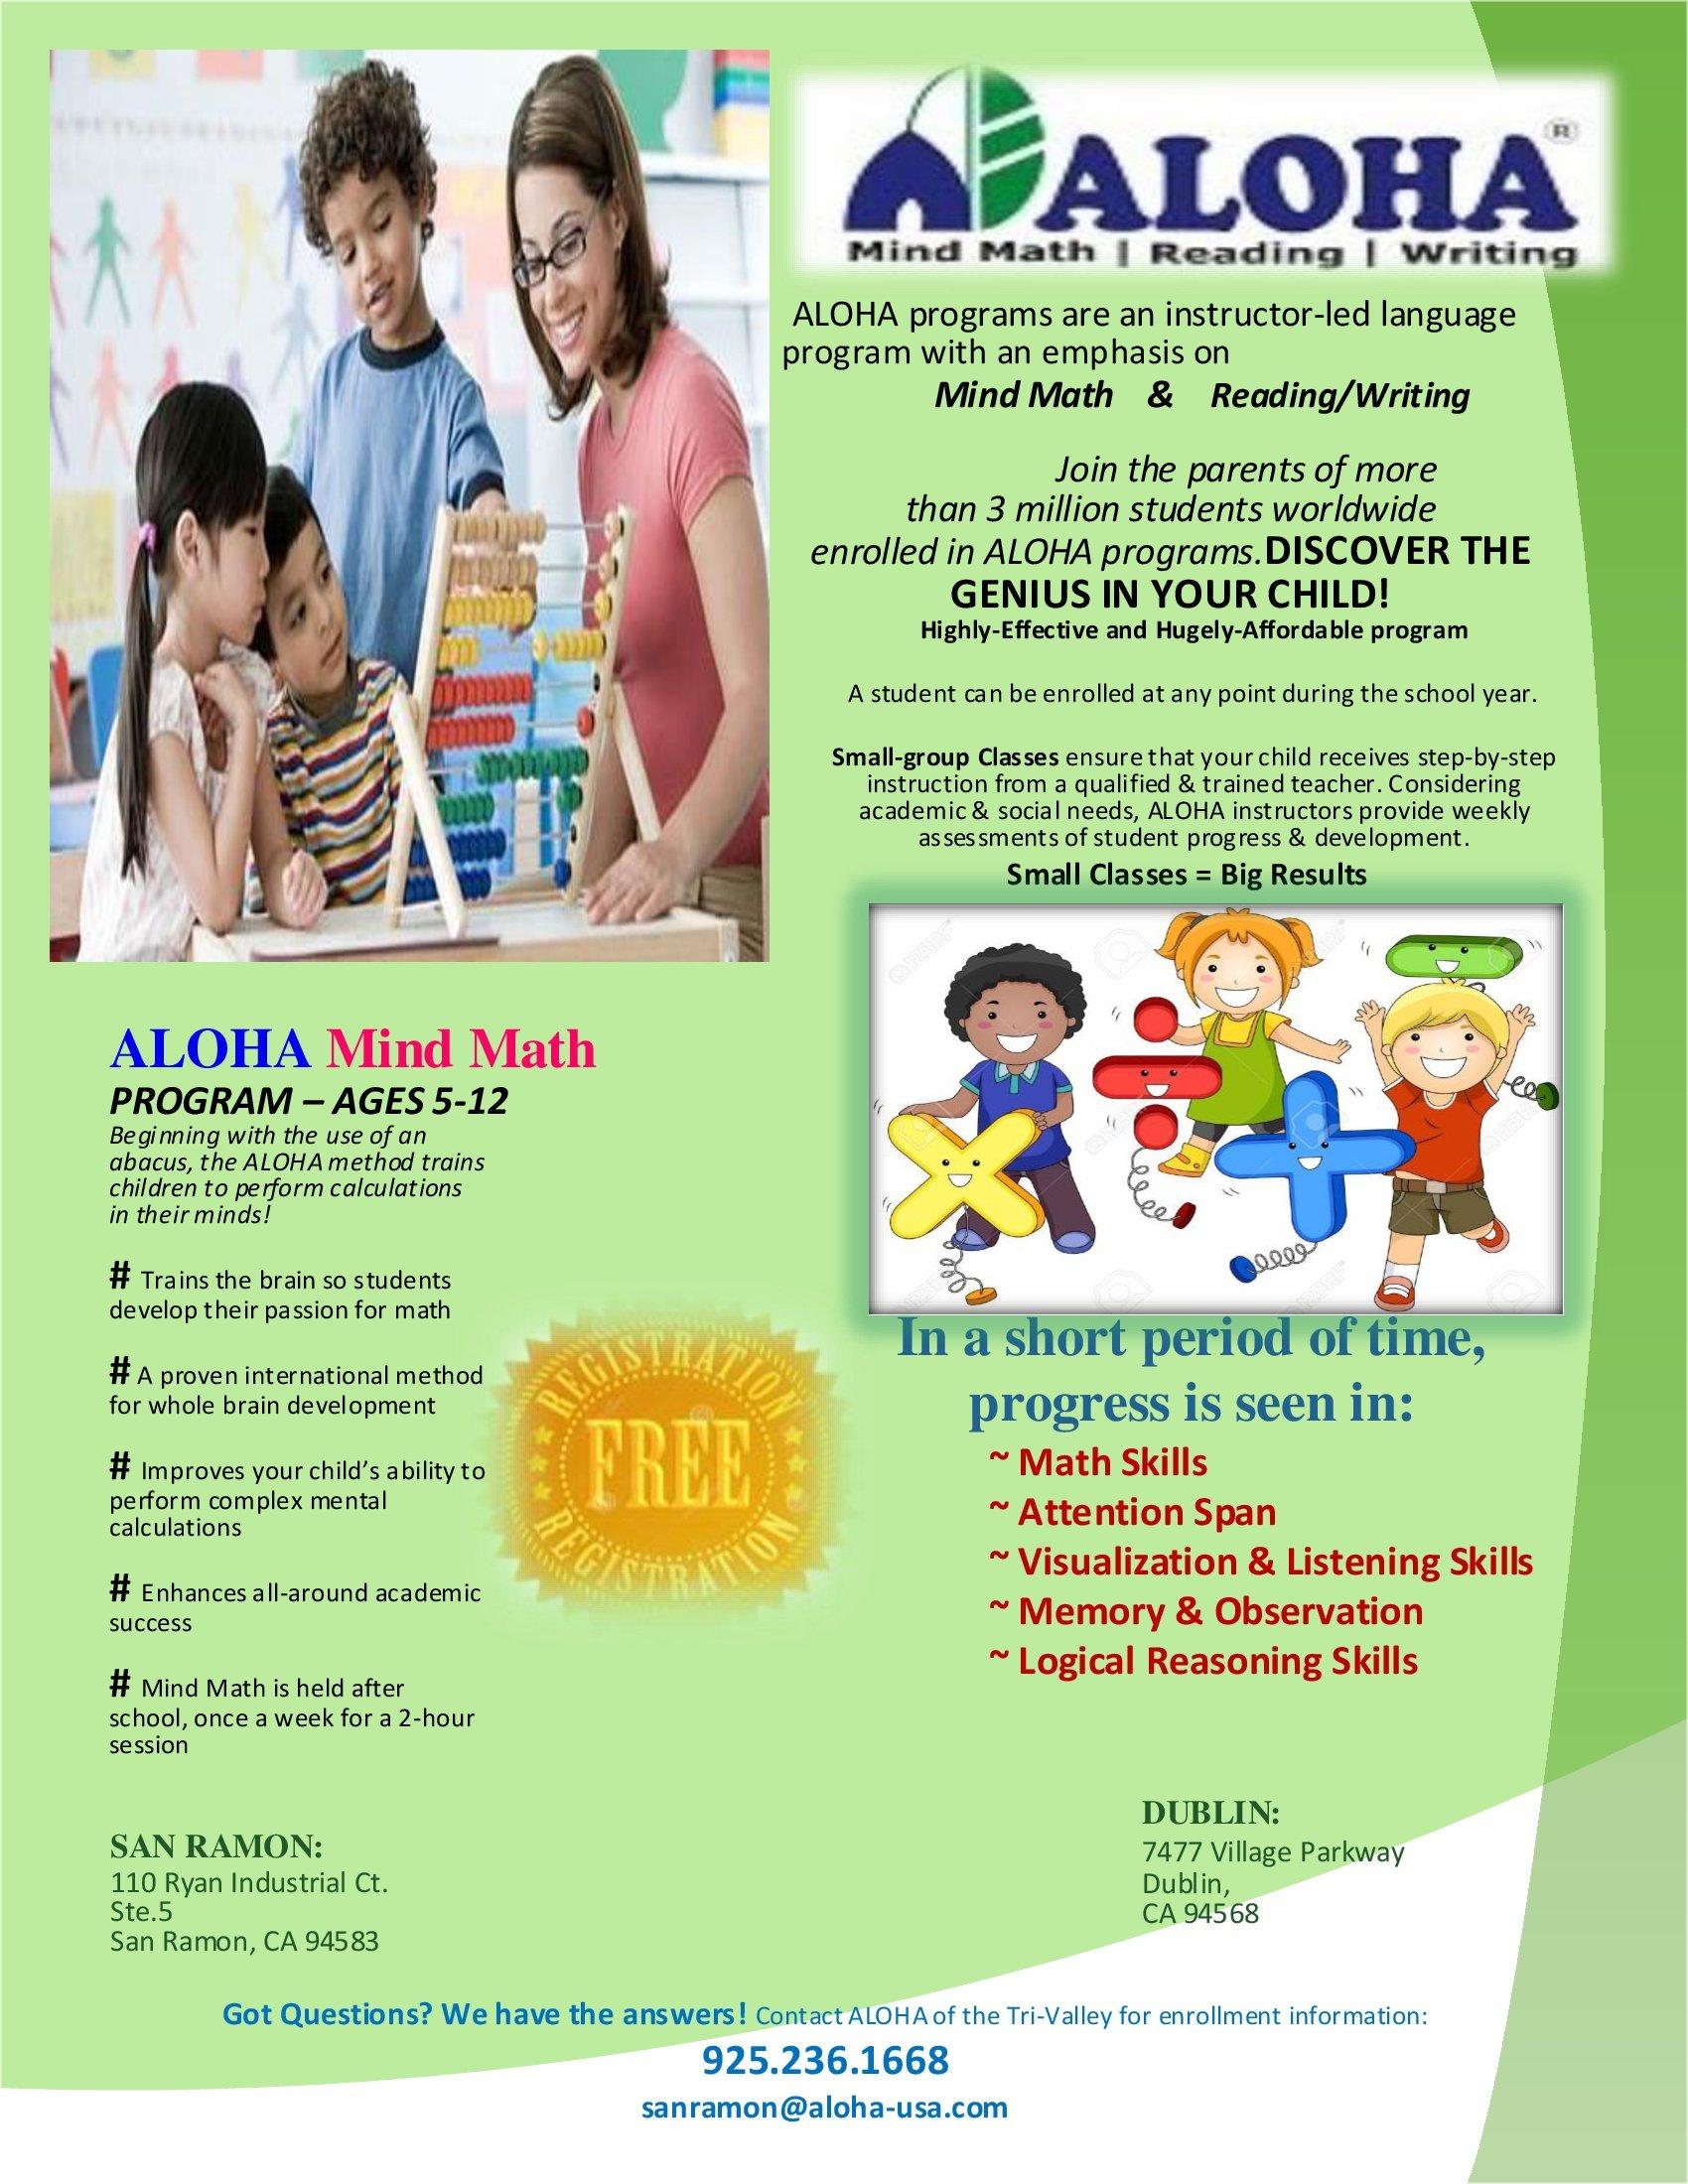 Math | Indian desis in San Ramon, Dublin, Pleasanton, Livermore ...